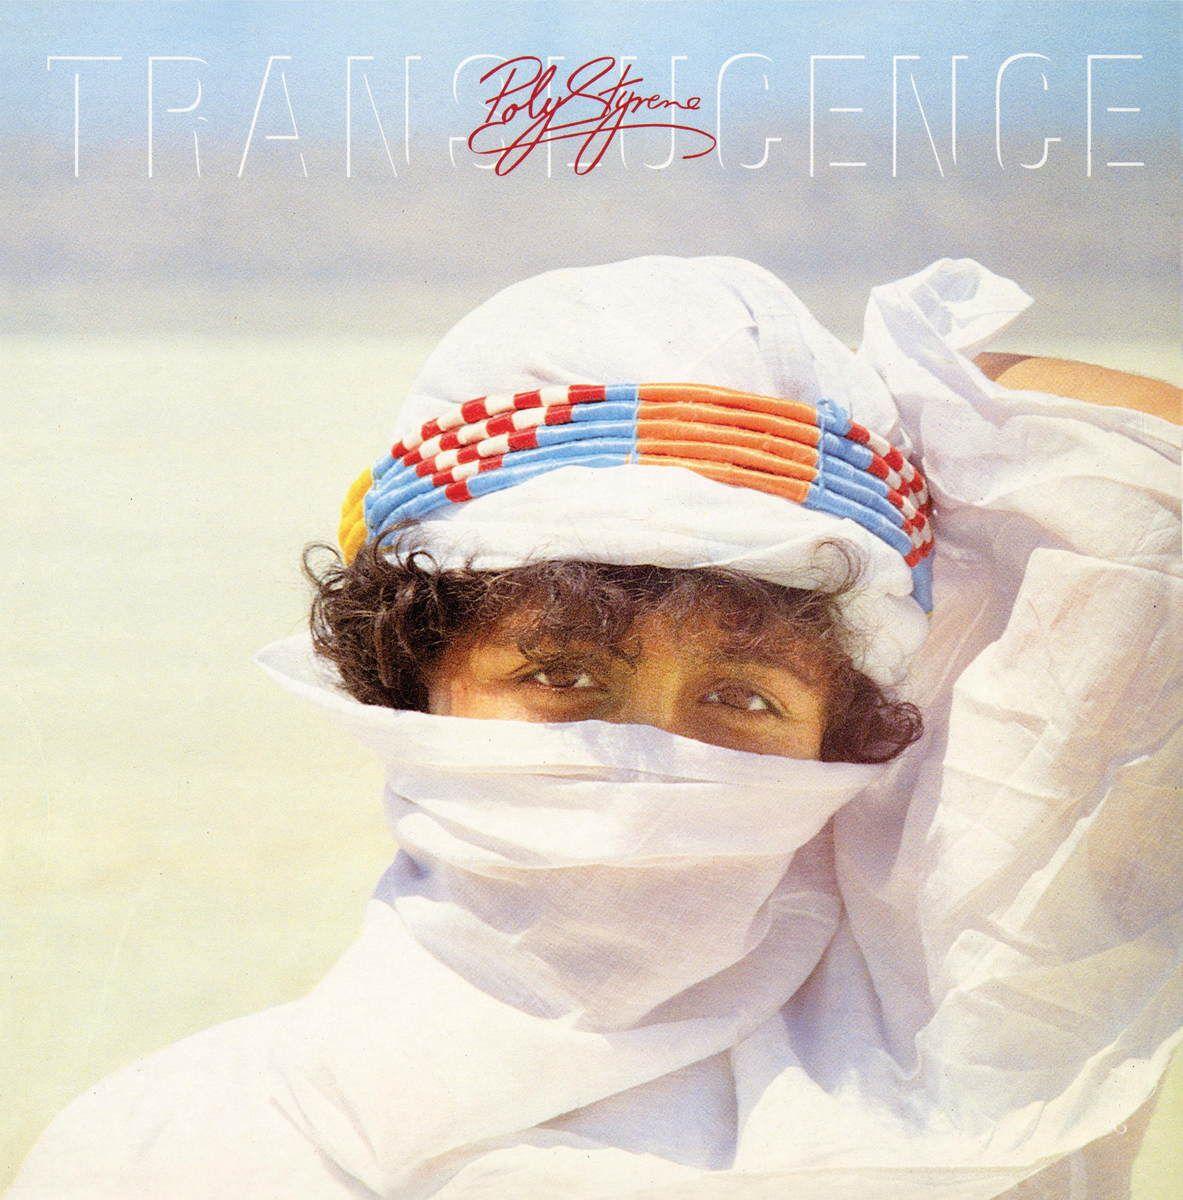 Виниловая пластинка Poly Styrene - Translucence (RSD2021/Limited Crystal Clear Vinyl)